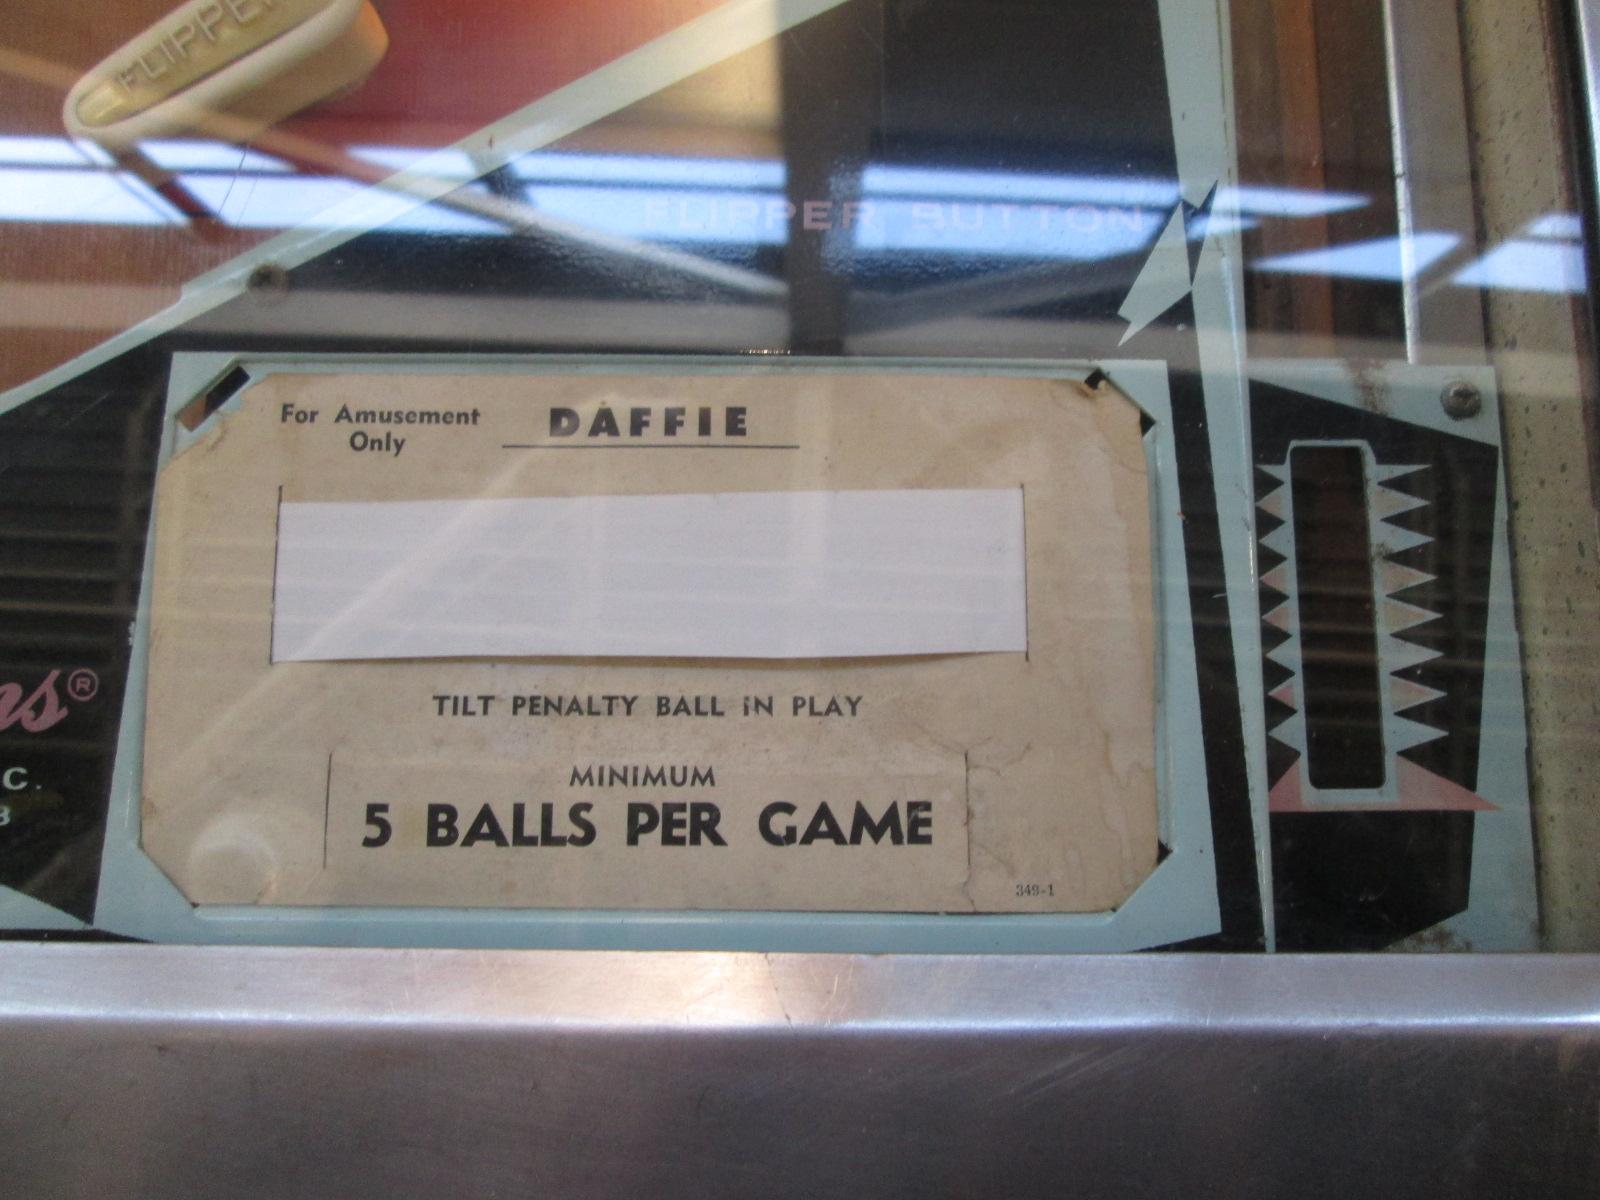 ed1475: Daffie (Pinball: 5 Balls) 19,840 points on 2017-05-19 16:33:48